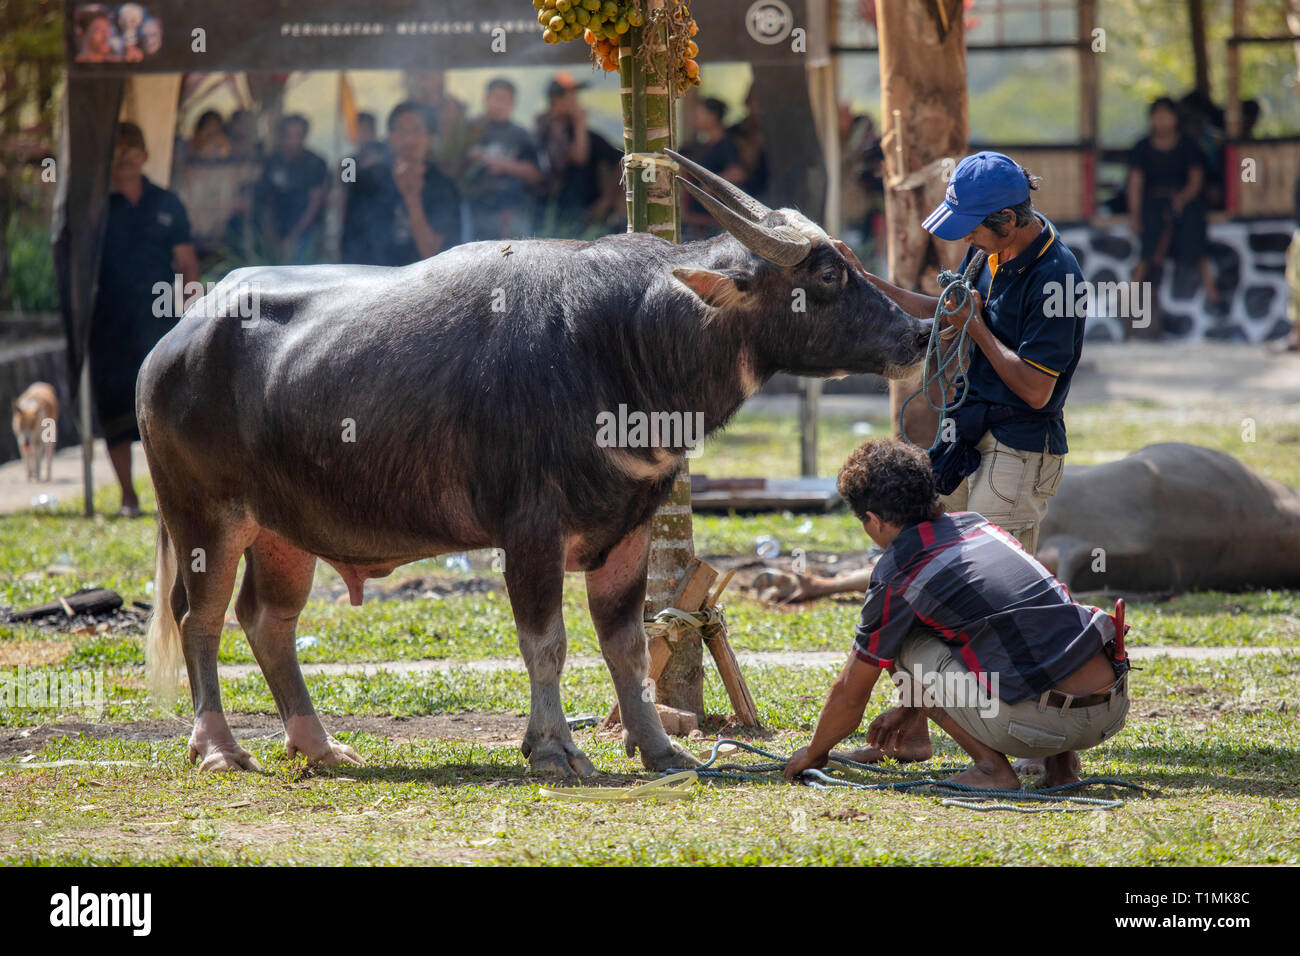 A buffalo sacrifice at a funeral ceremony in Tana Toraja, Sulawesi, Indonesia - Stock Image